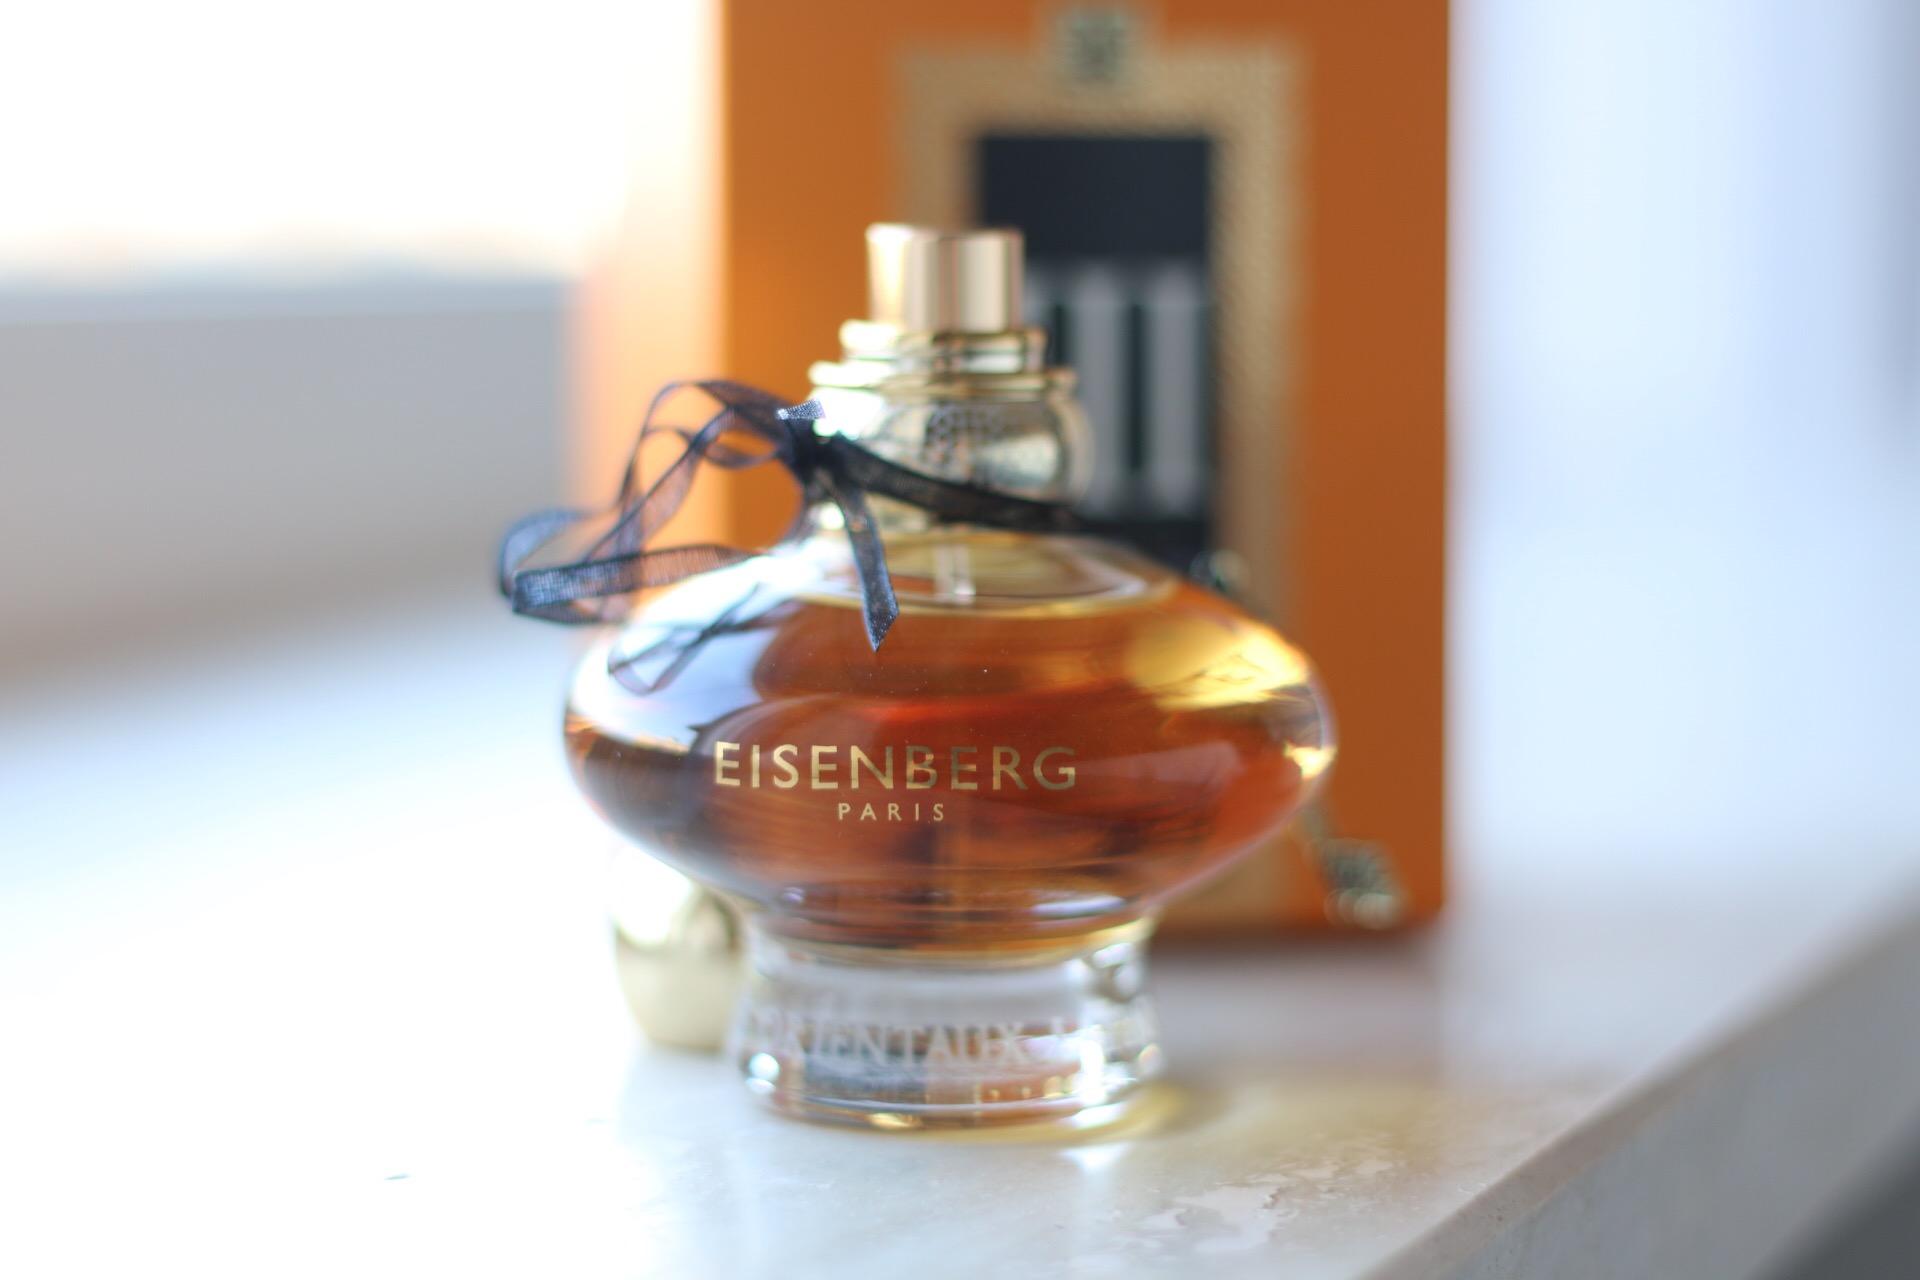 Eisenberg5